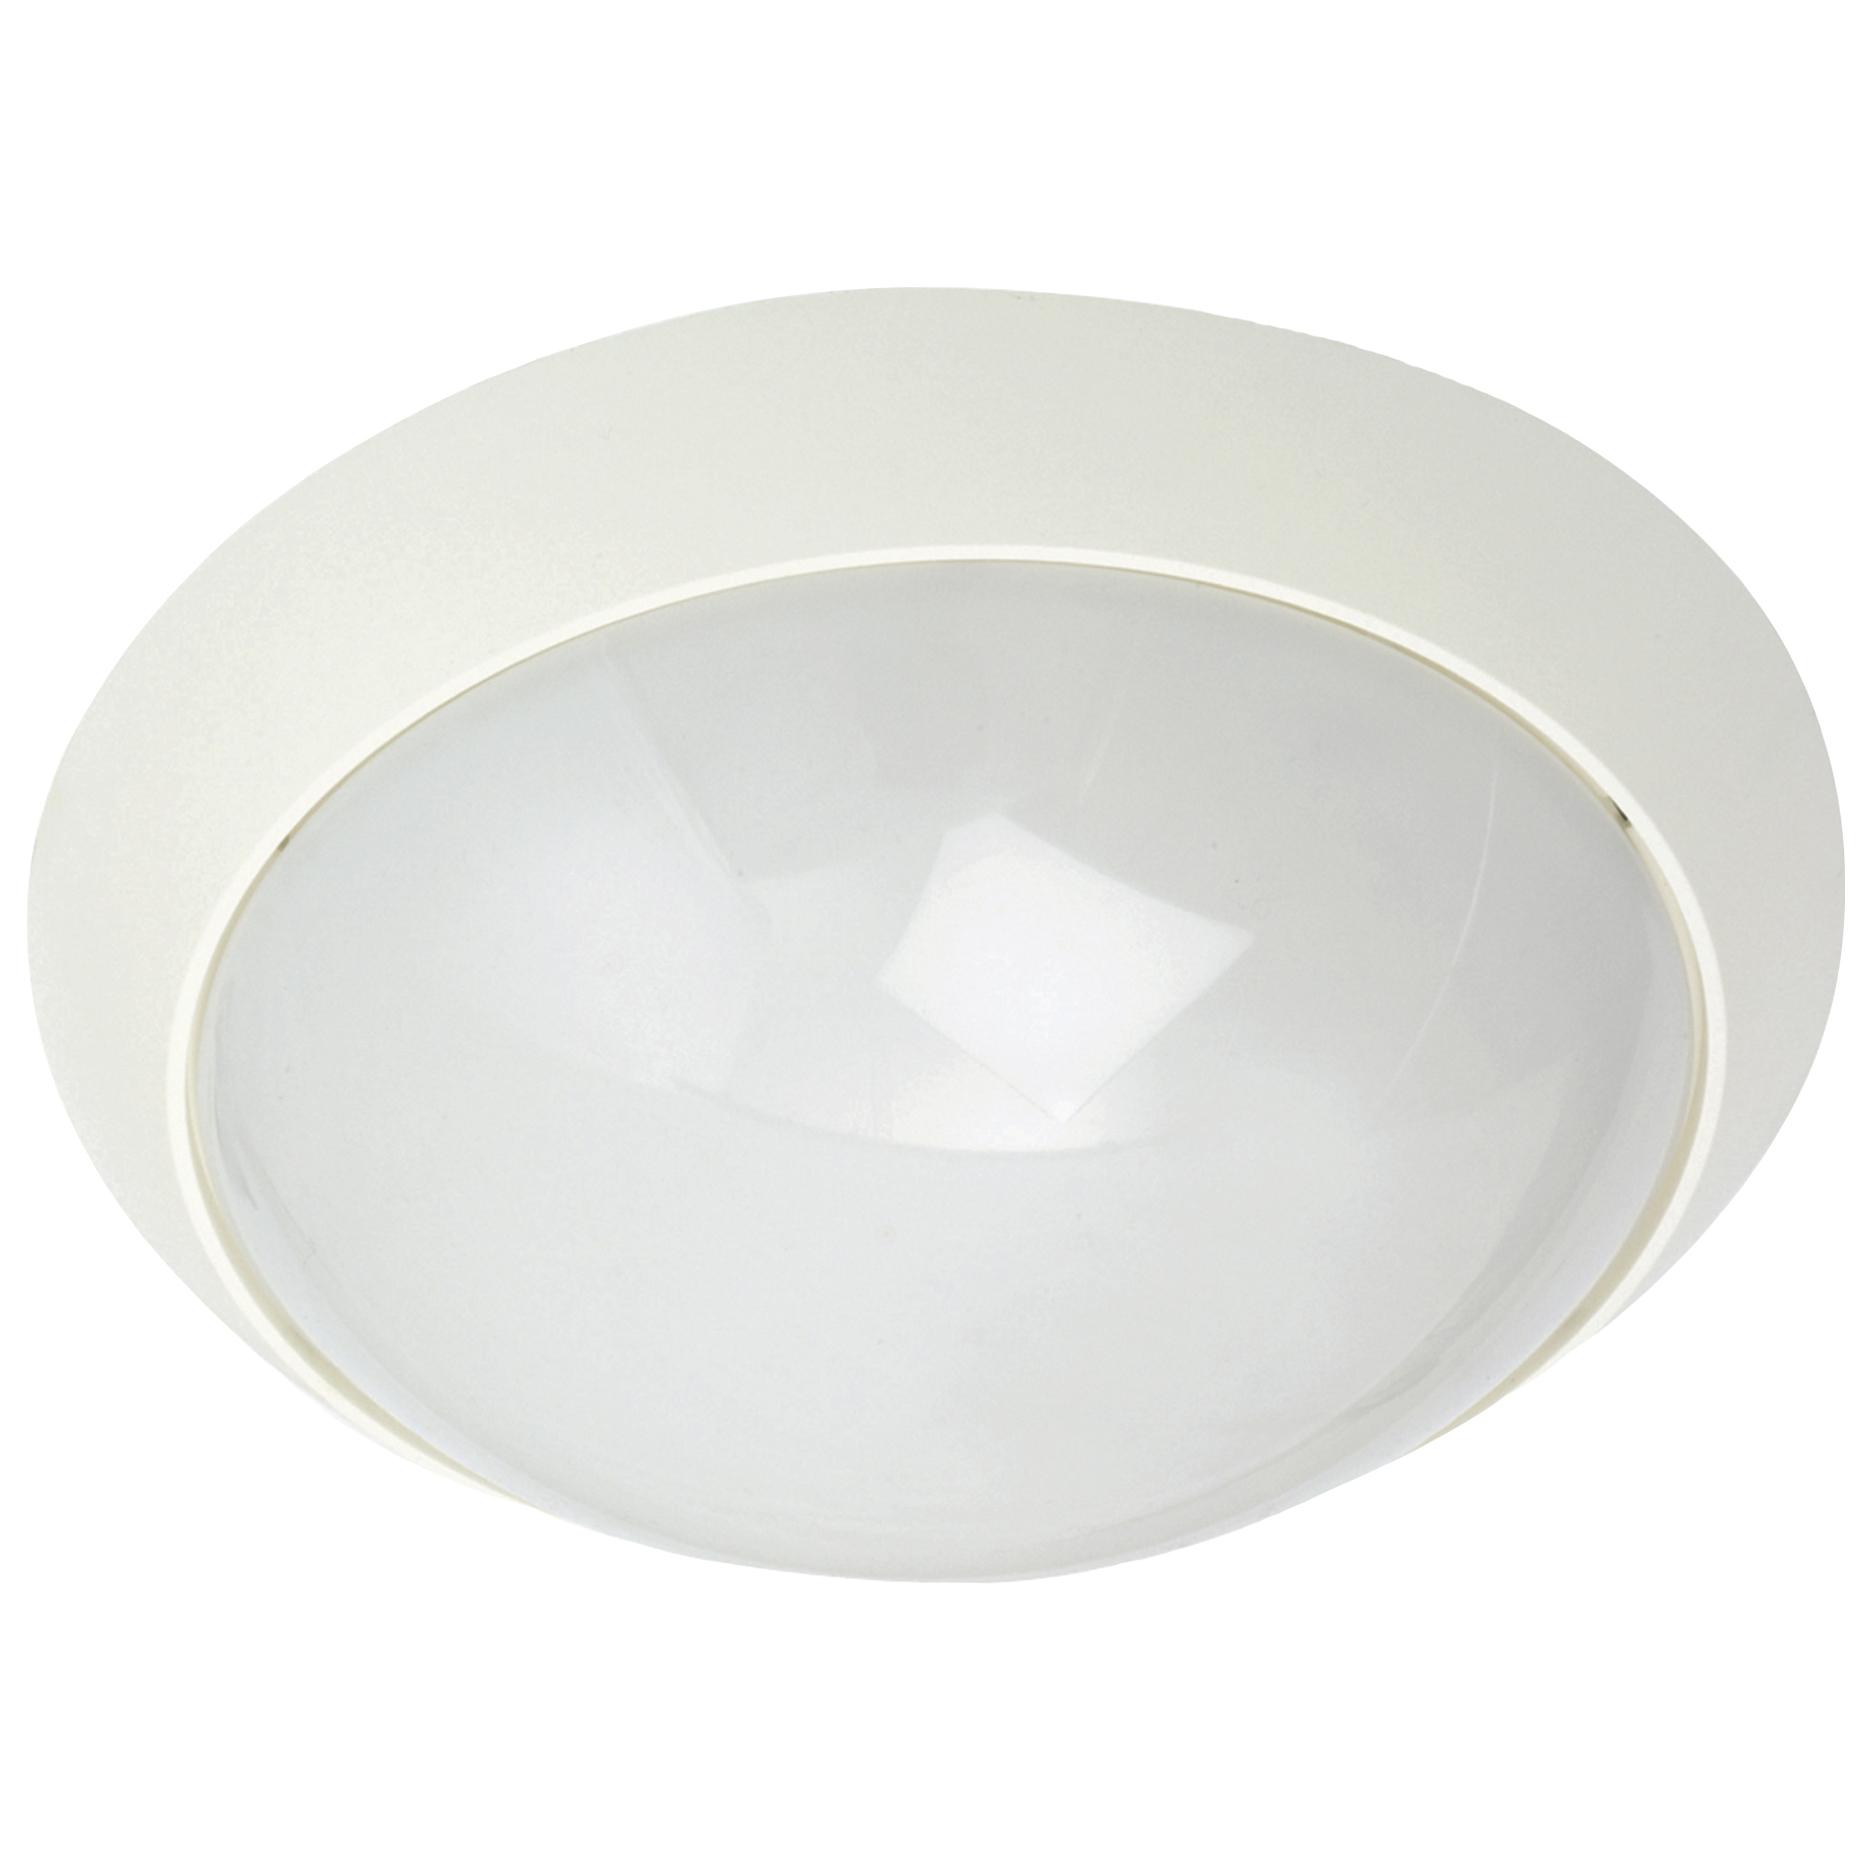 Plafondlamp 35cm E27 SG Econ MIDI PC wit geschikt voor led lamp